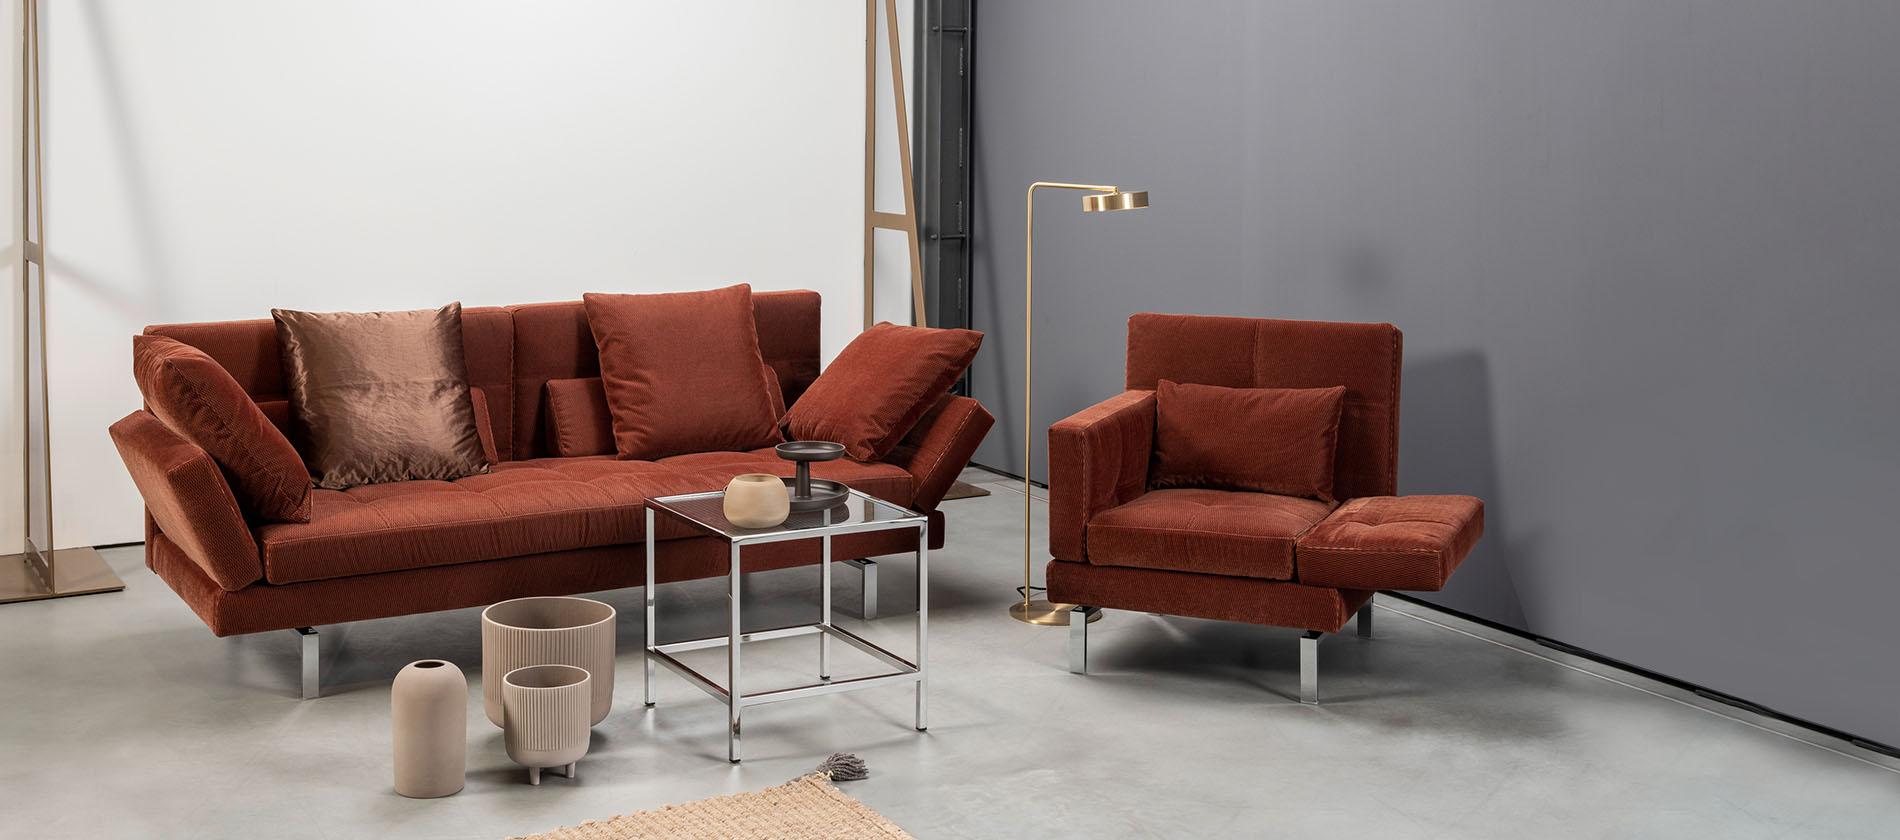 Design Schlafsofa Daybed Elegant Kombination